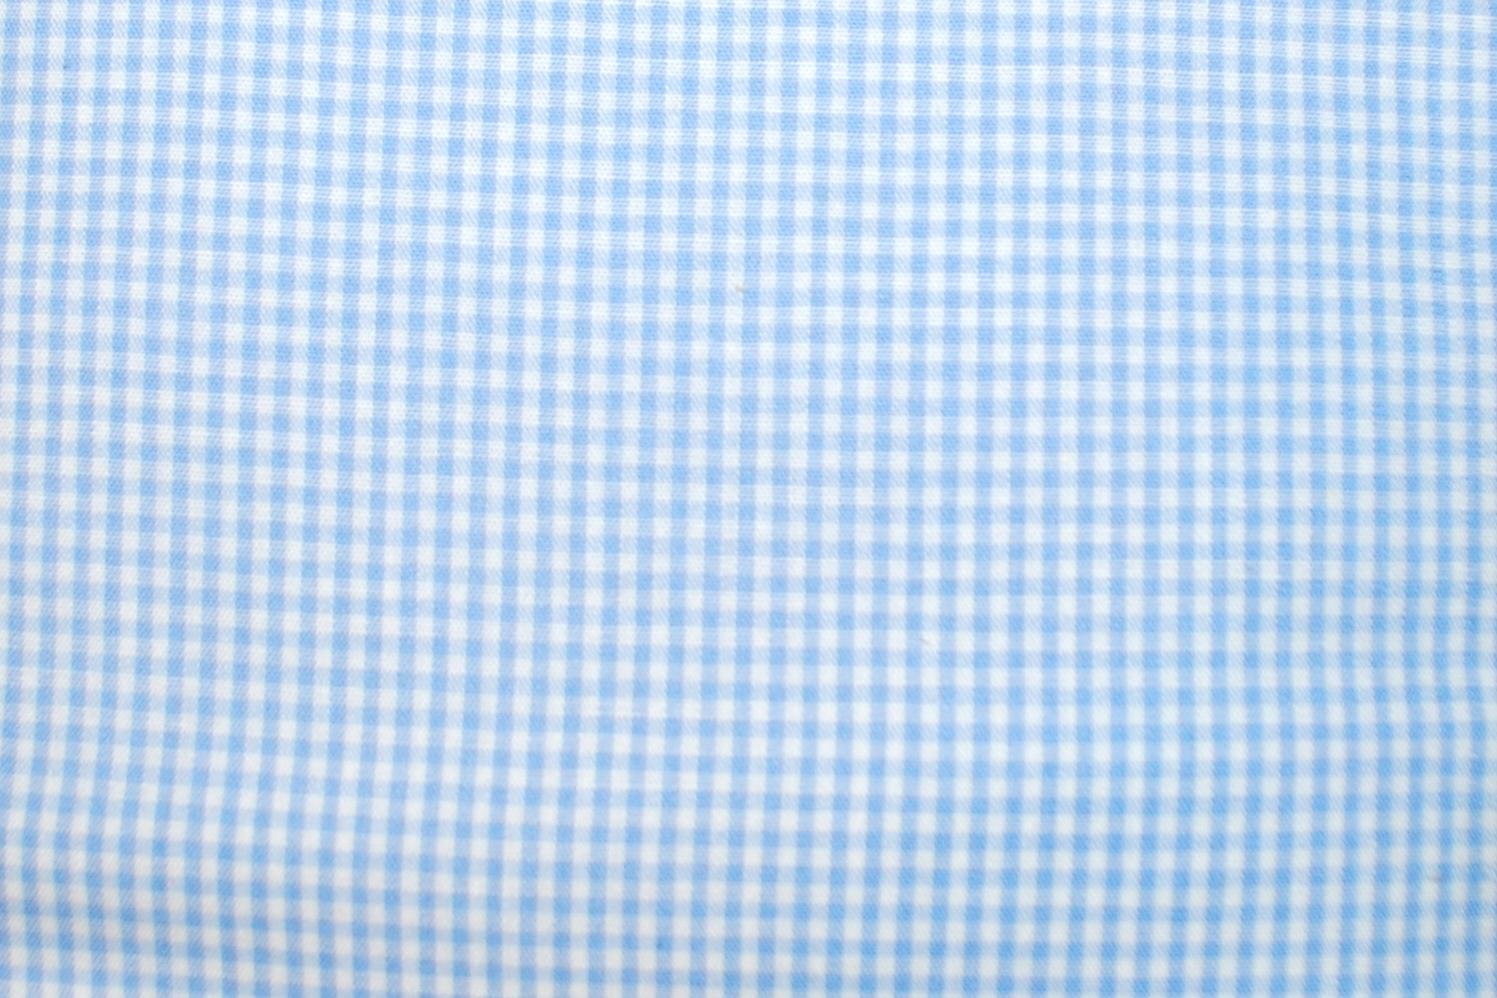 Sew Happy In Stock Fabric